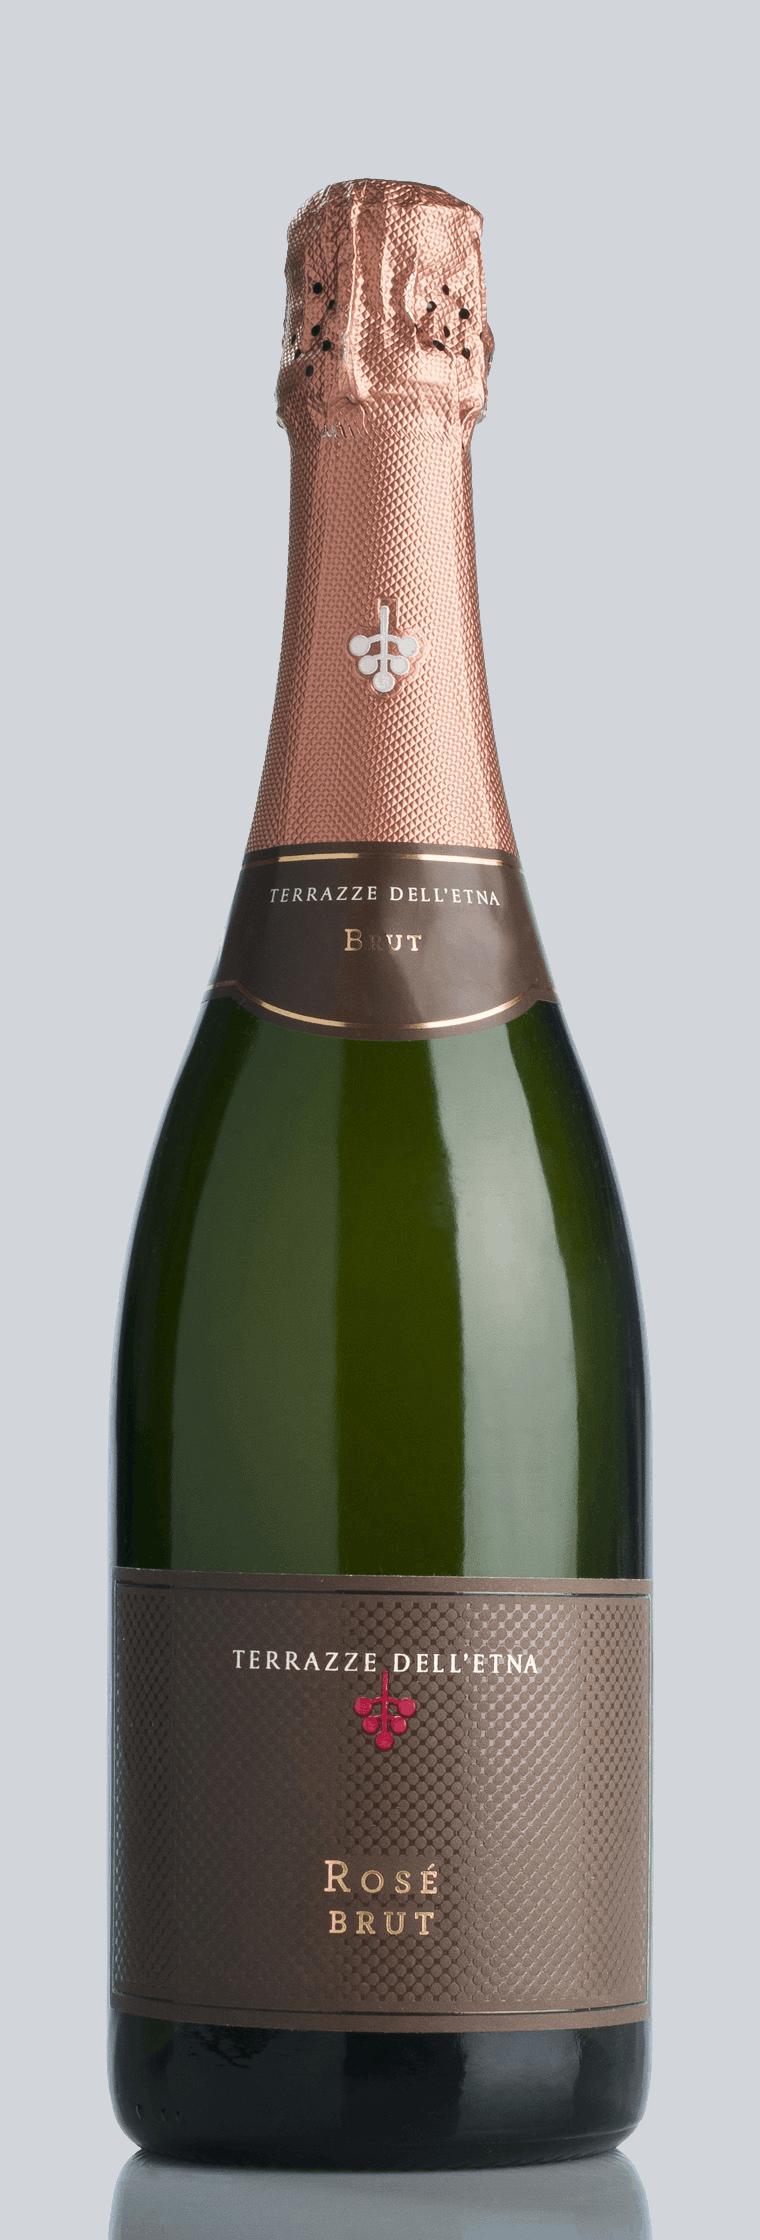 Rosé Brut  bottle